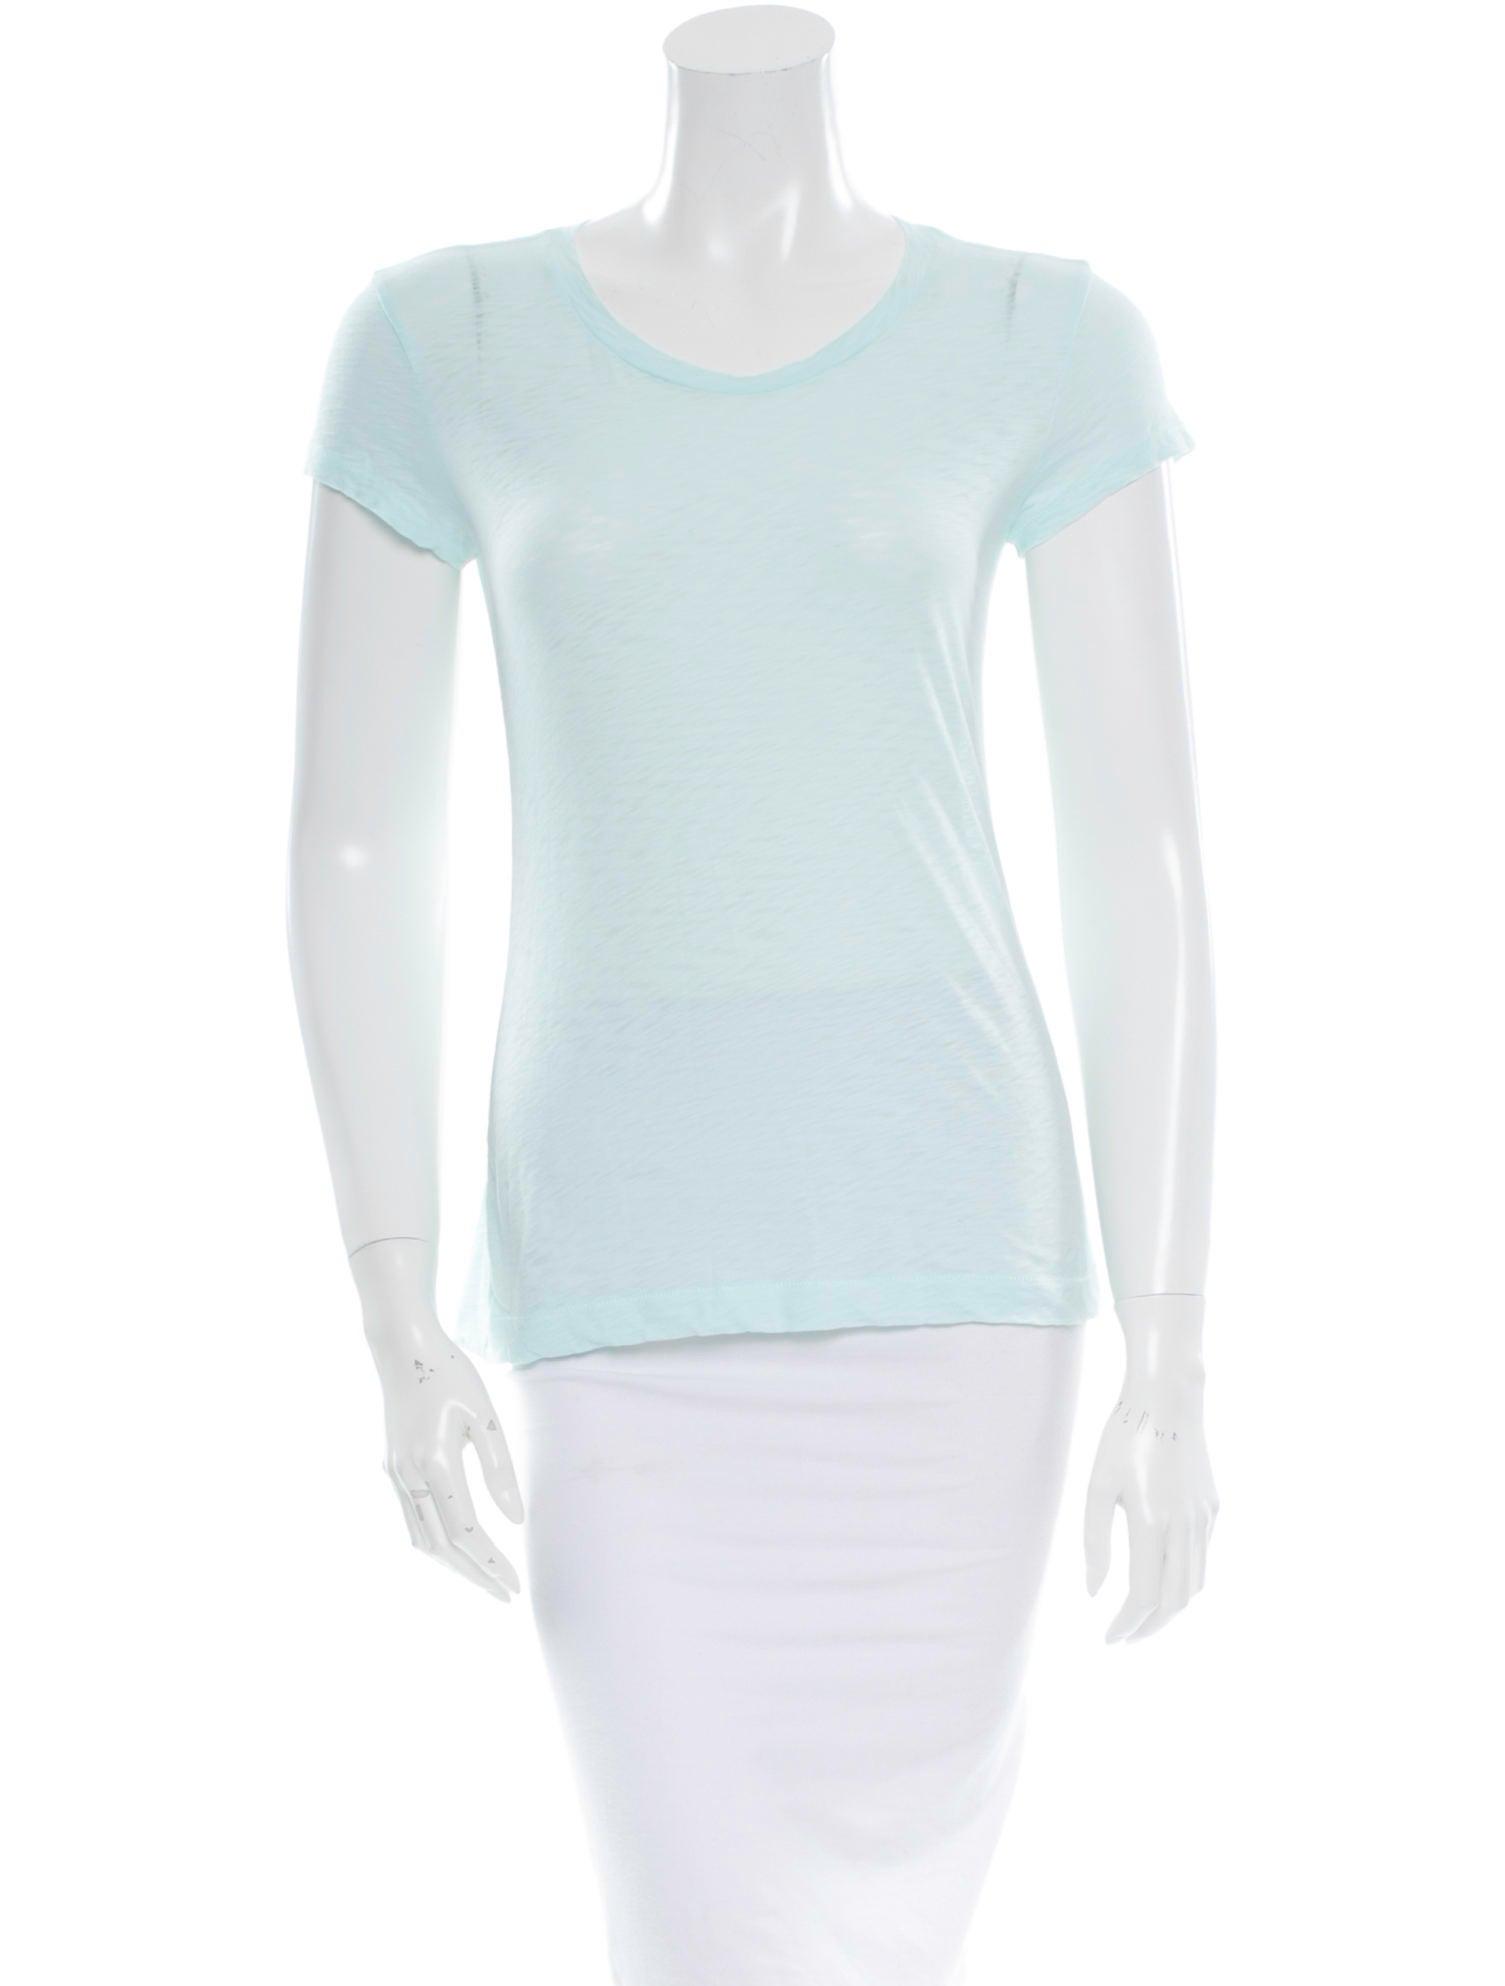 Rag bone t shirt tops wragb31613 the realreal for Rag and bone t shirts